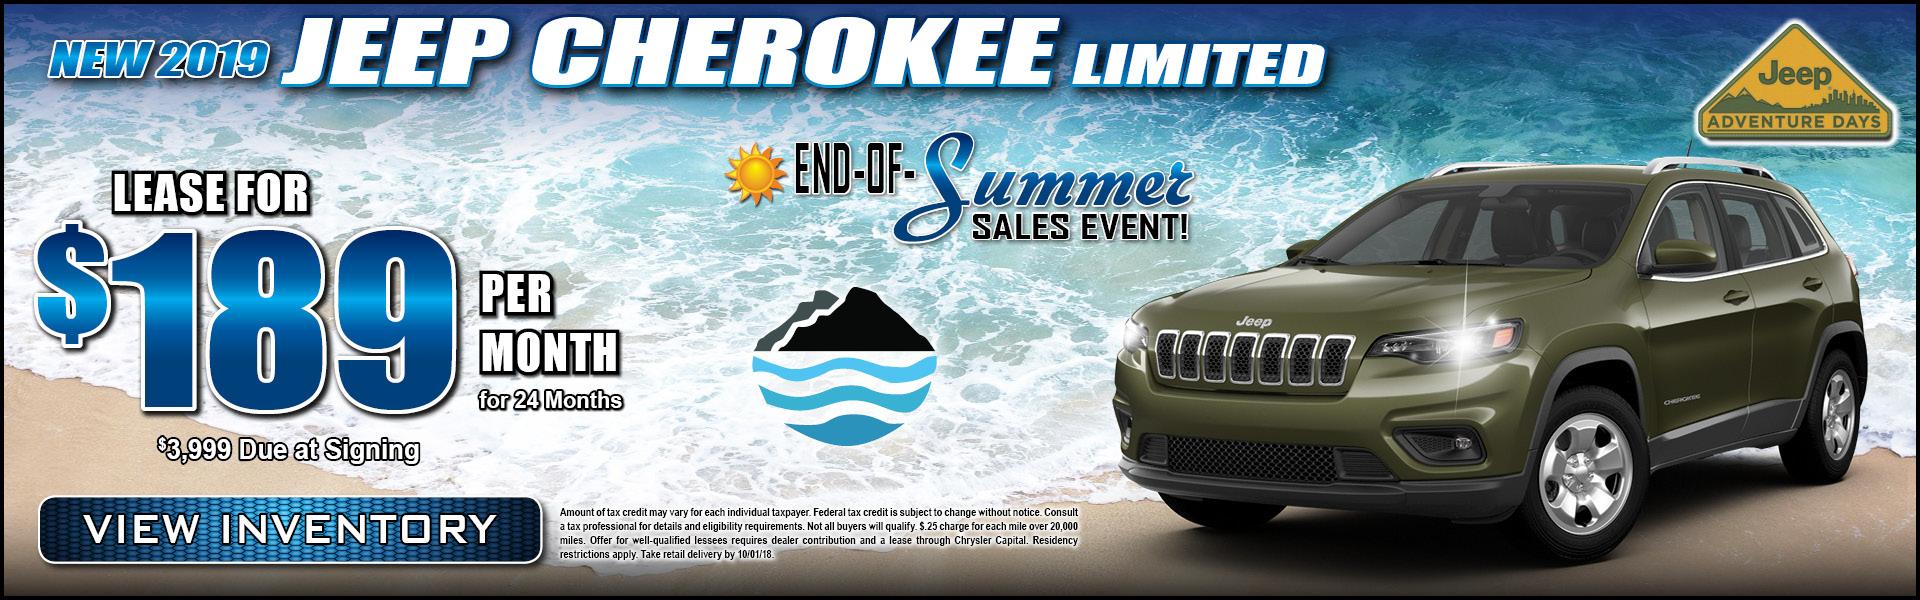 2019 Jeep Cherokee $189 Lease